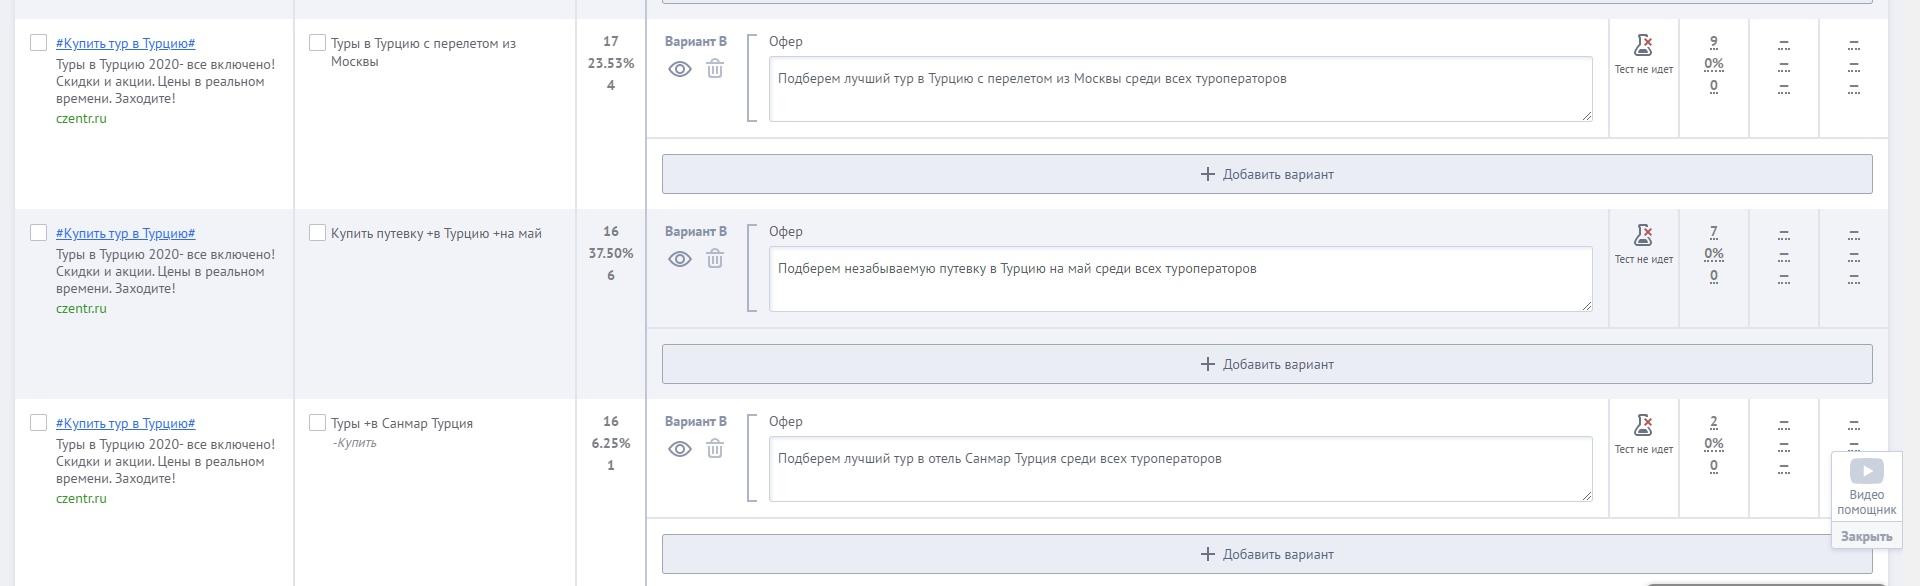 Кейс турфирмы – скриншот из Таблицы связок